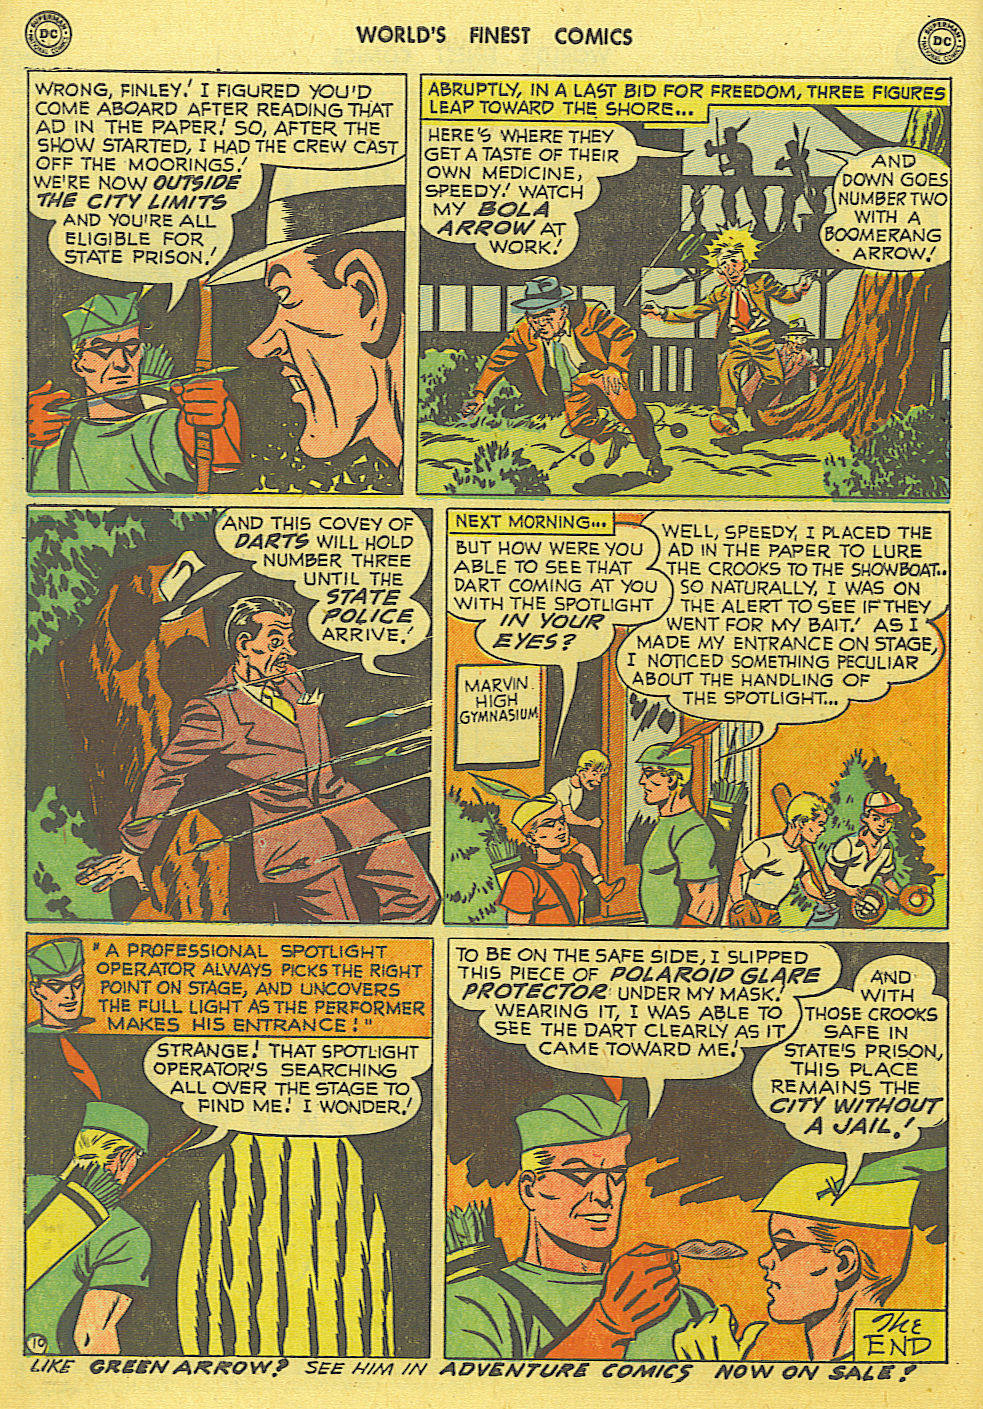 Read online World's Finest Comics comic -  Issue #49 - 27